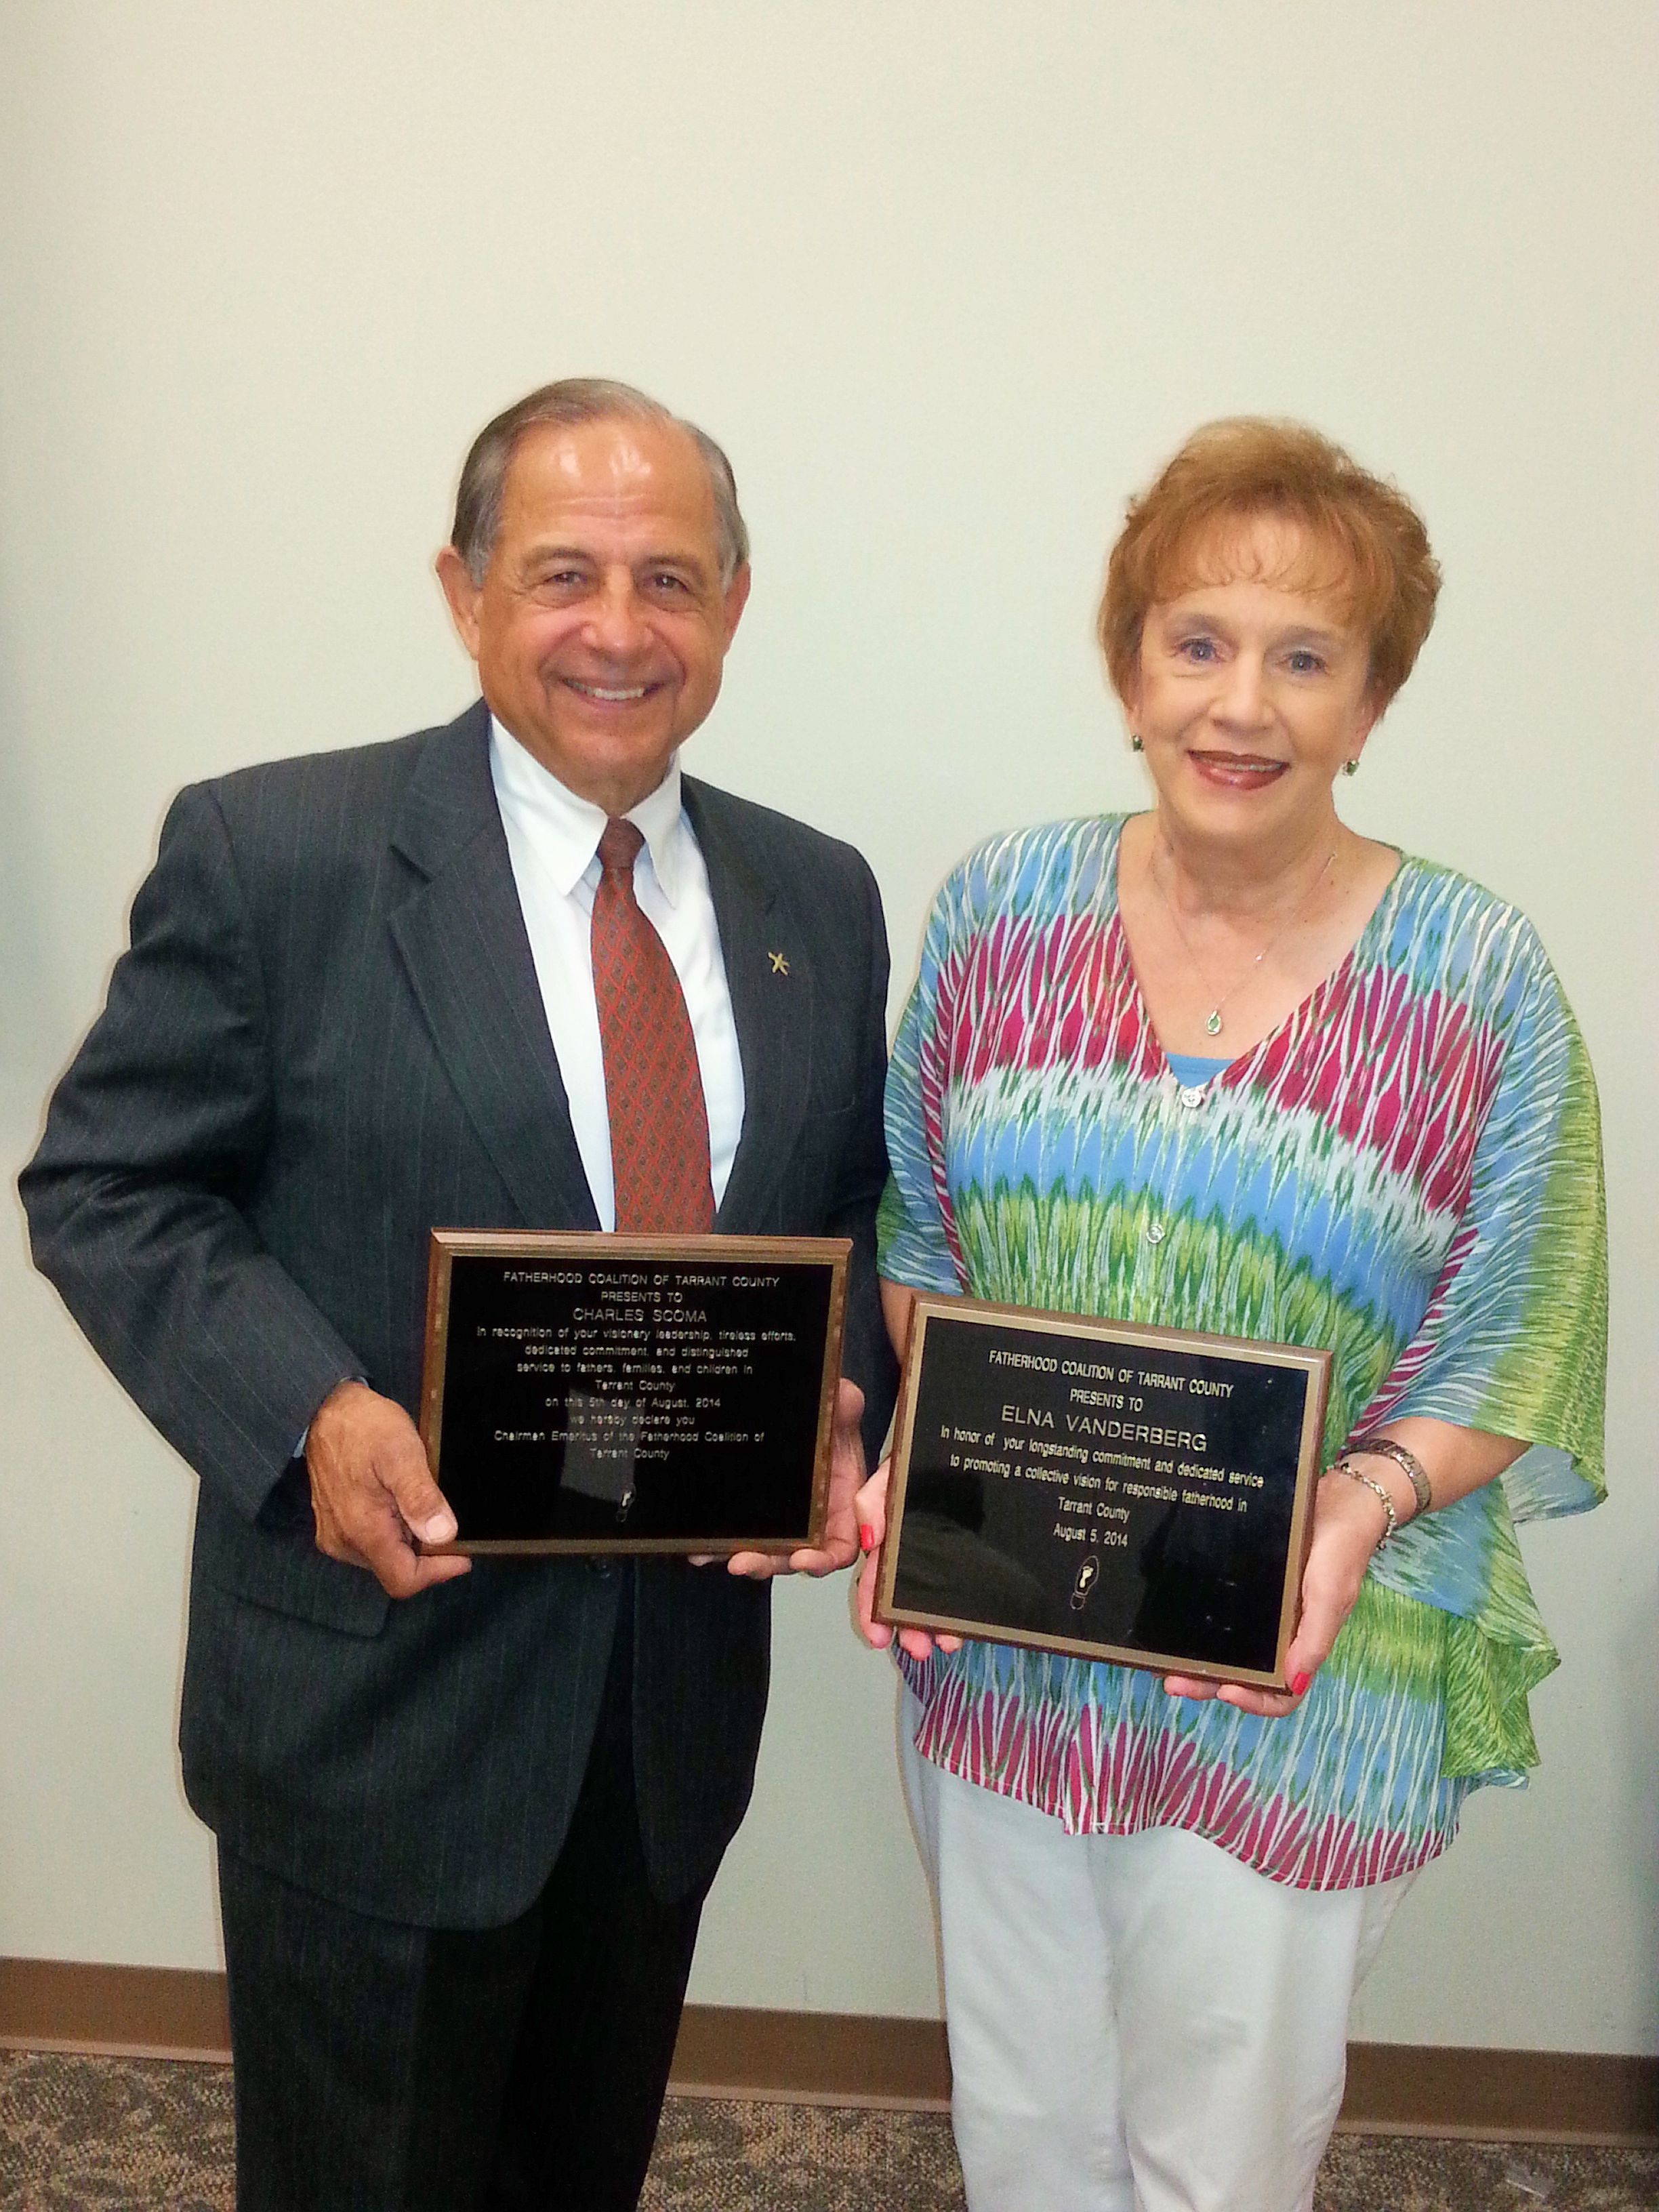 Elna was honored by tarrant county fatherhood coalition